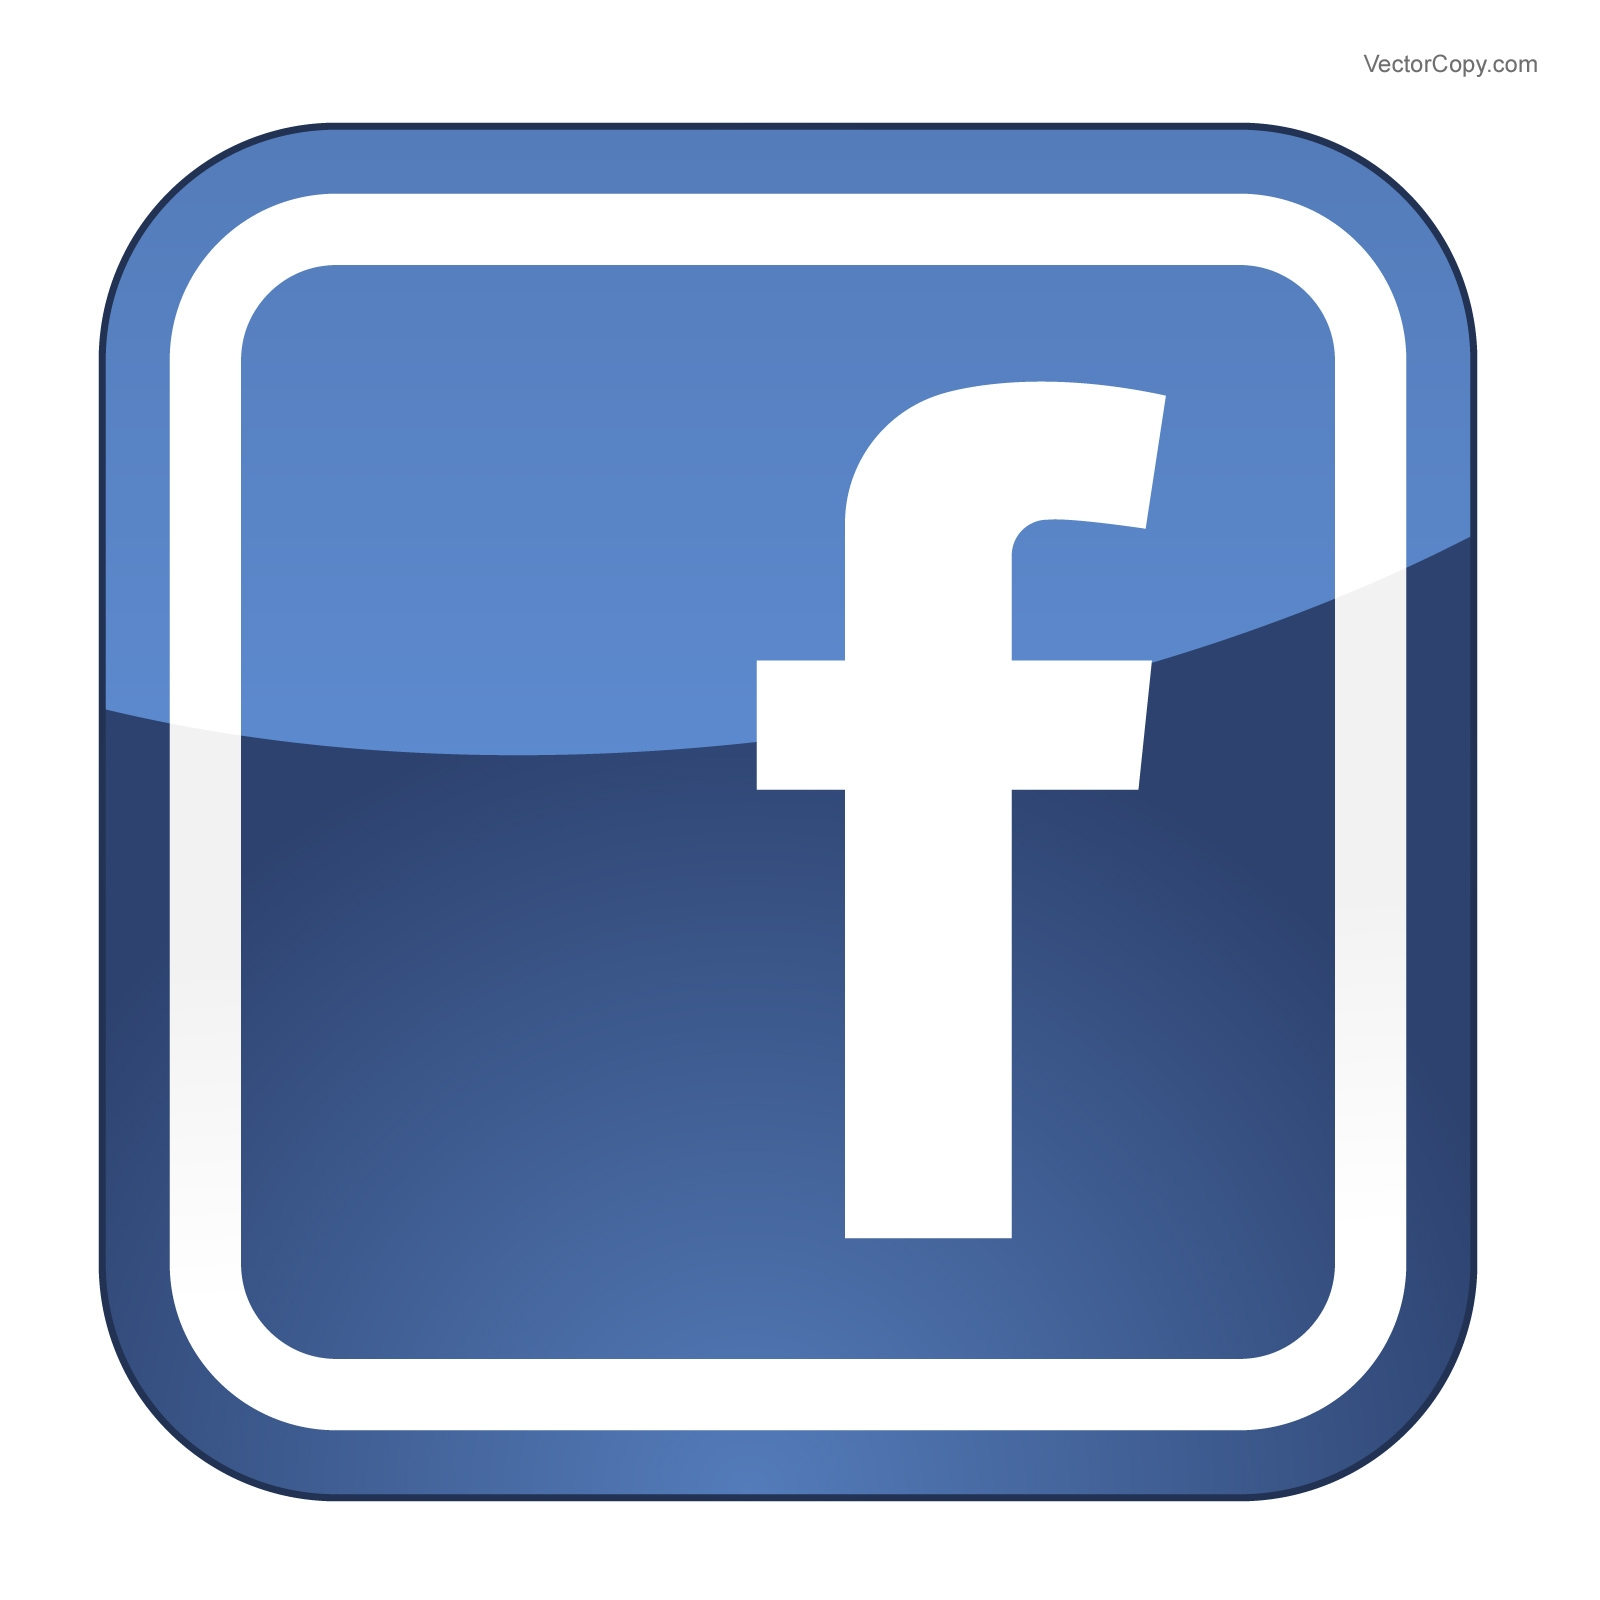 facebook clipart - 17 - e - Clipart Free Download Clip Art Free Clip Art